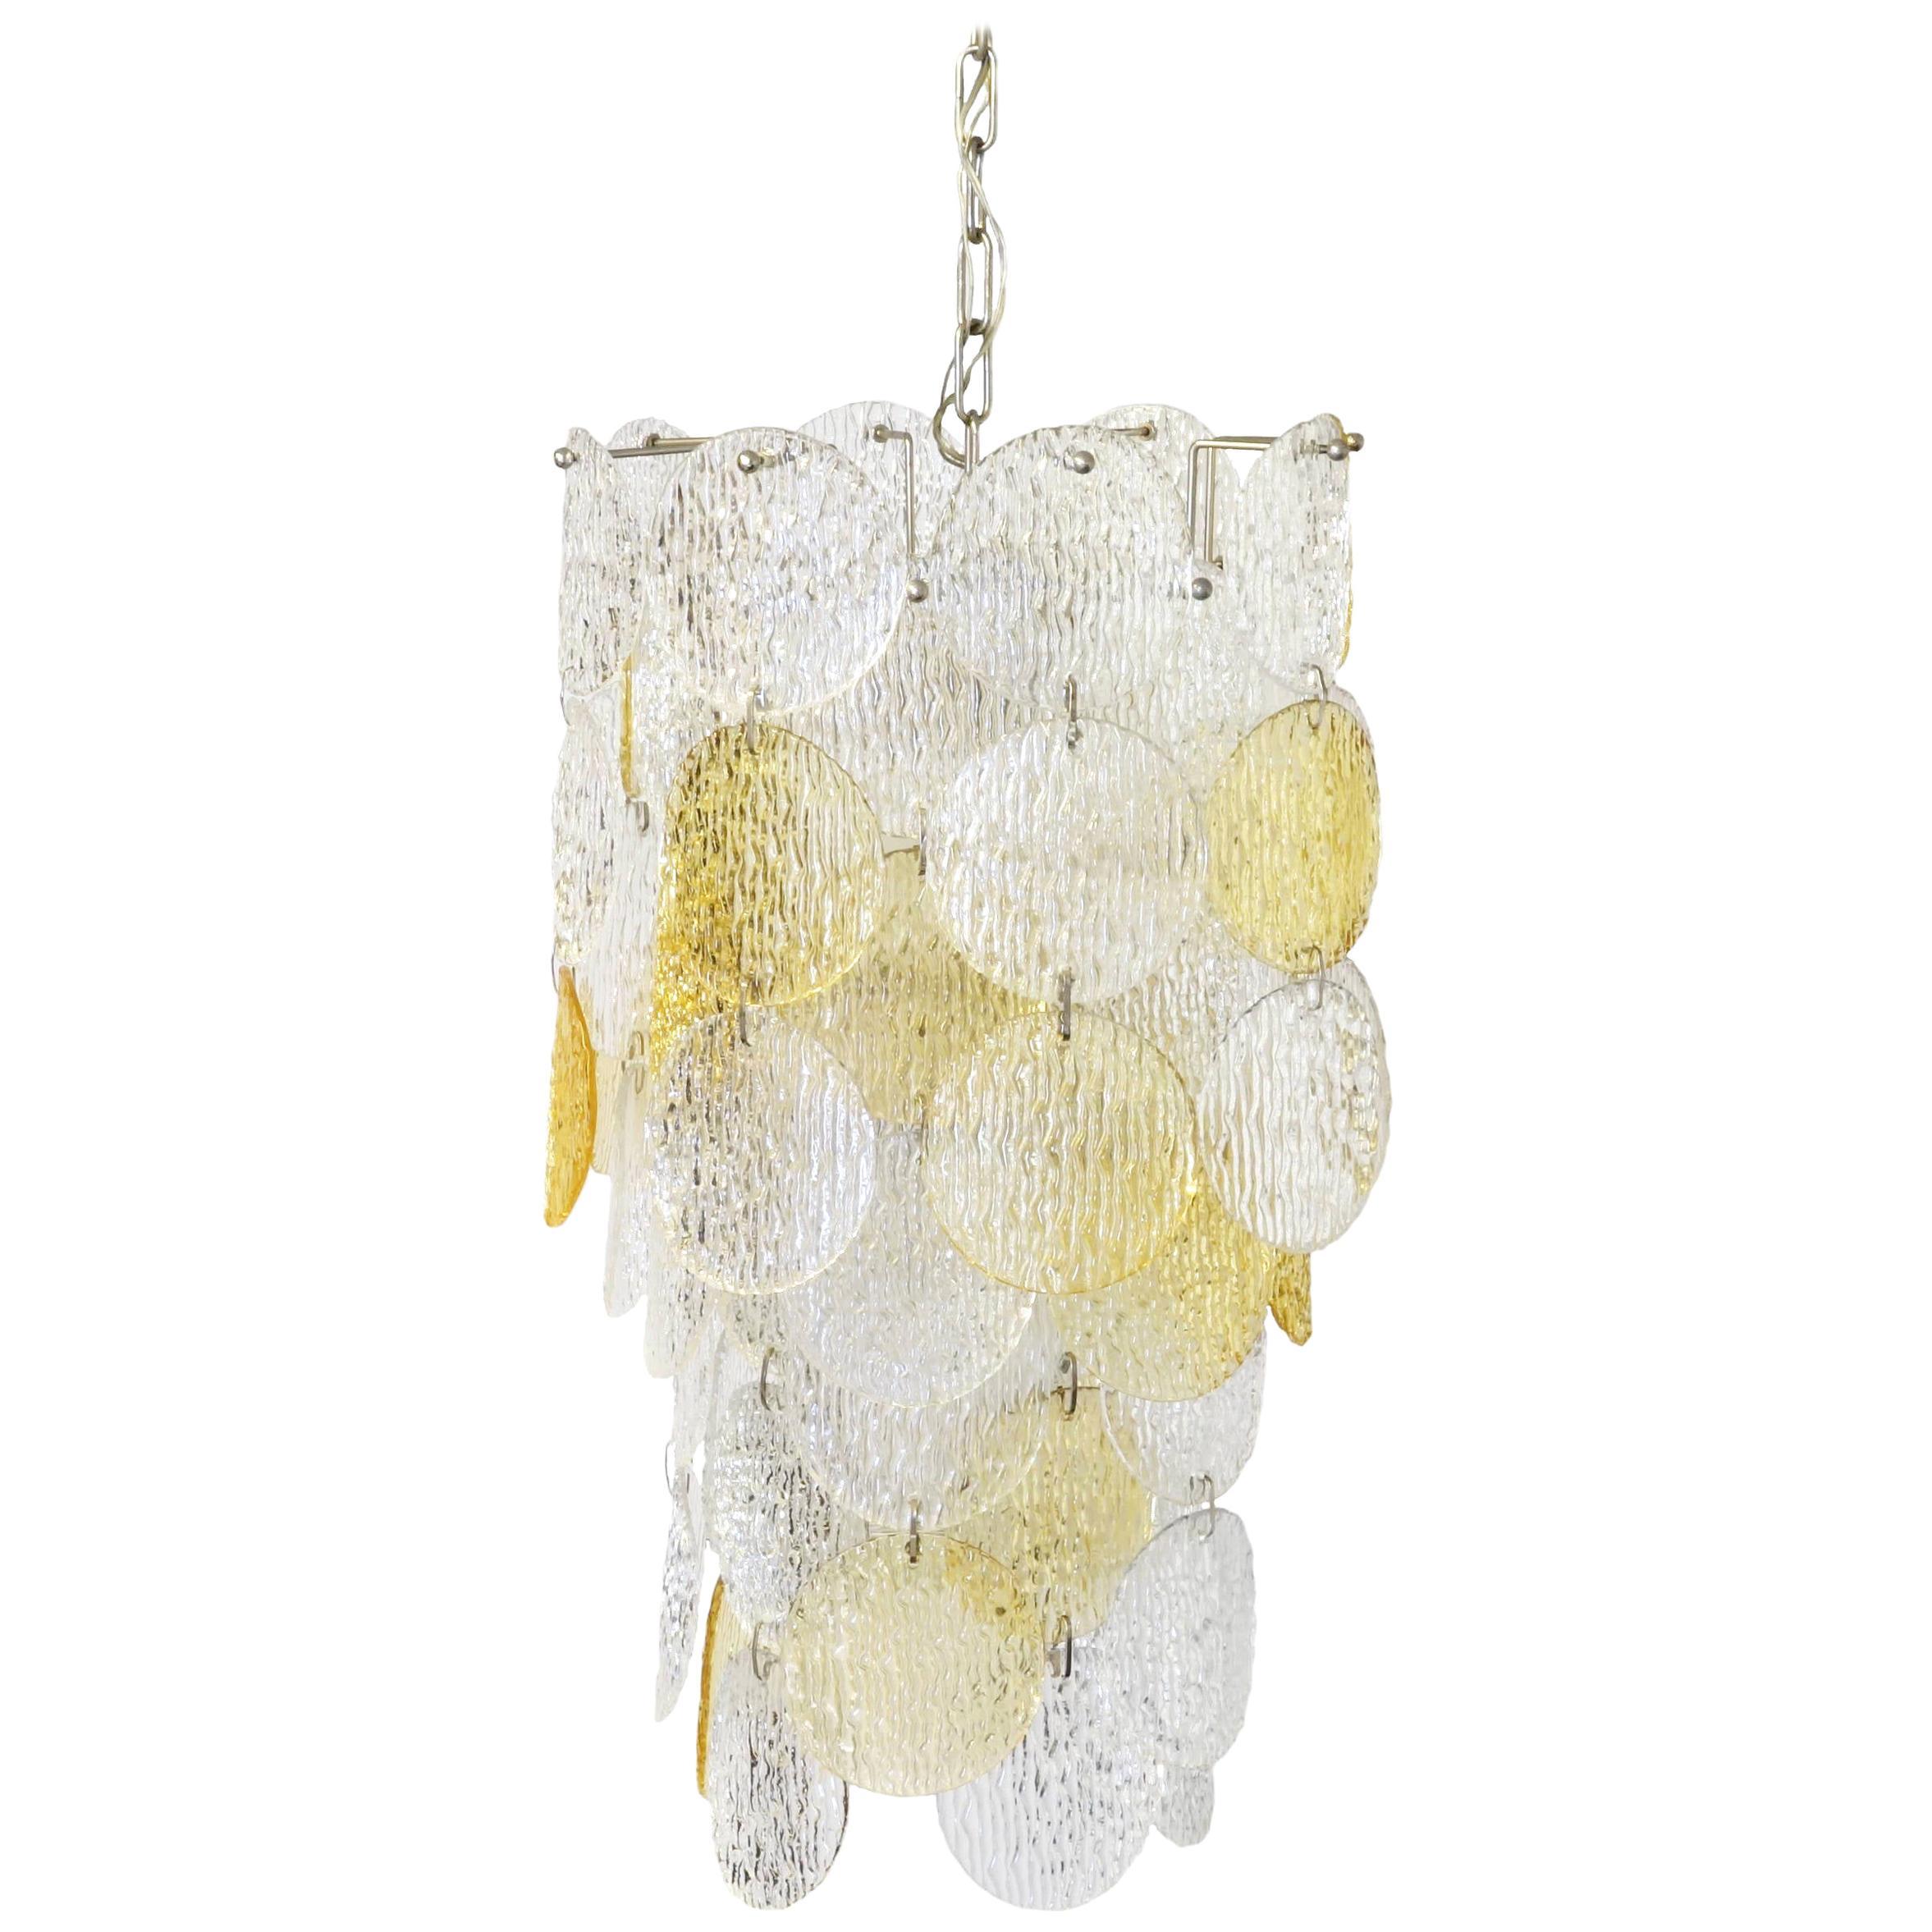 Chandelier Vistosi Torcello Murano Glass Pendant Italy 1970s Yellow White